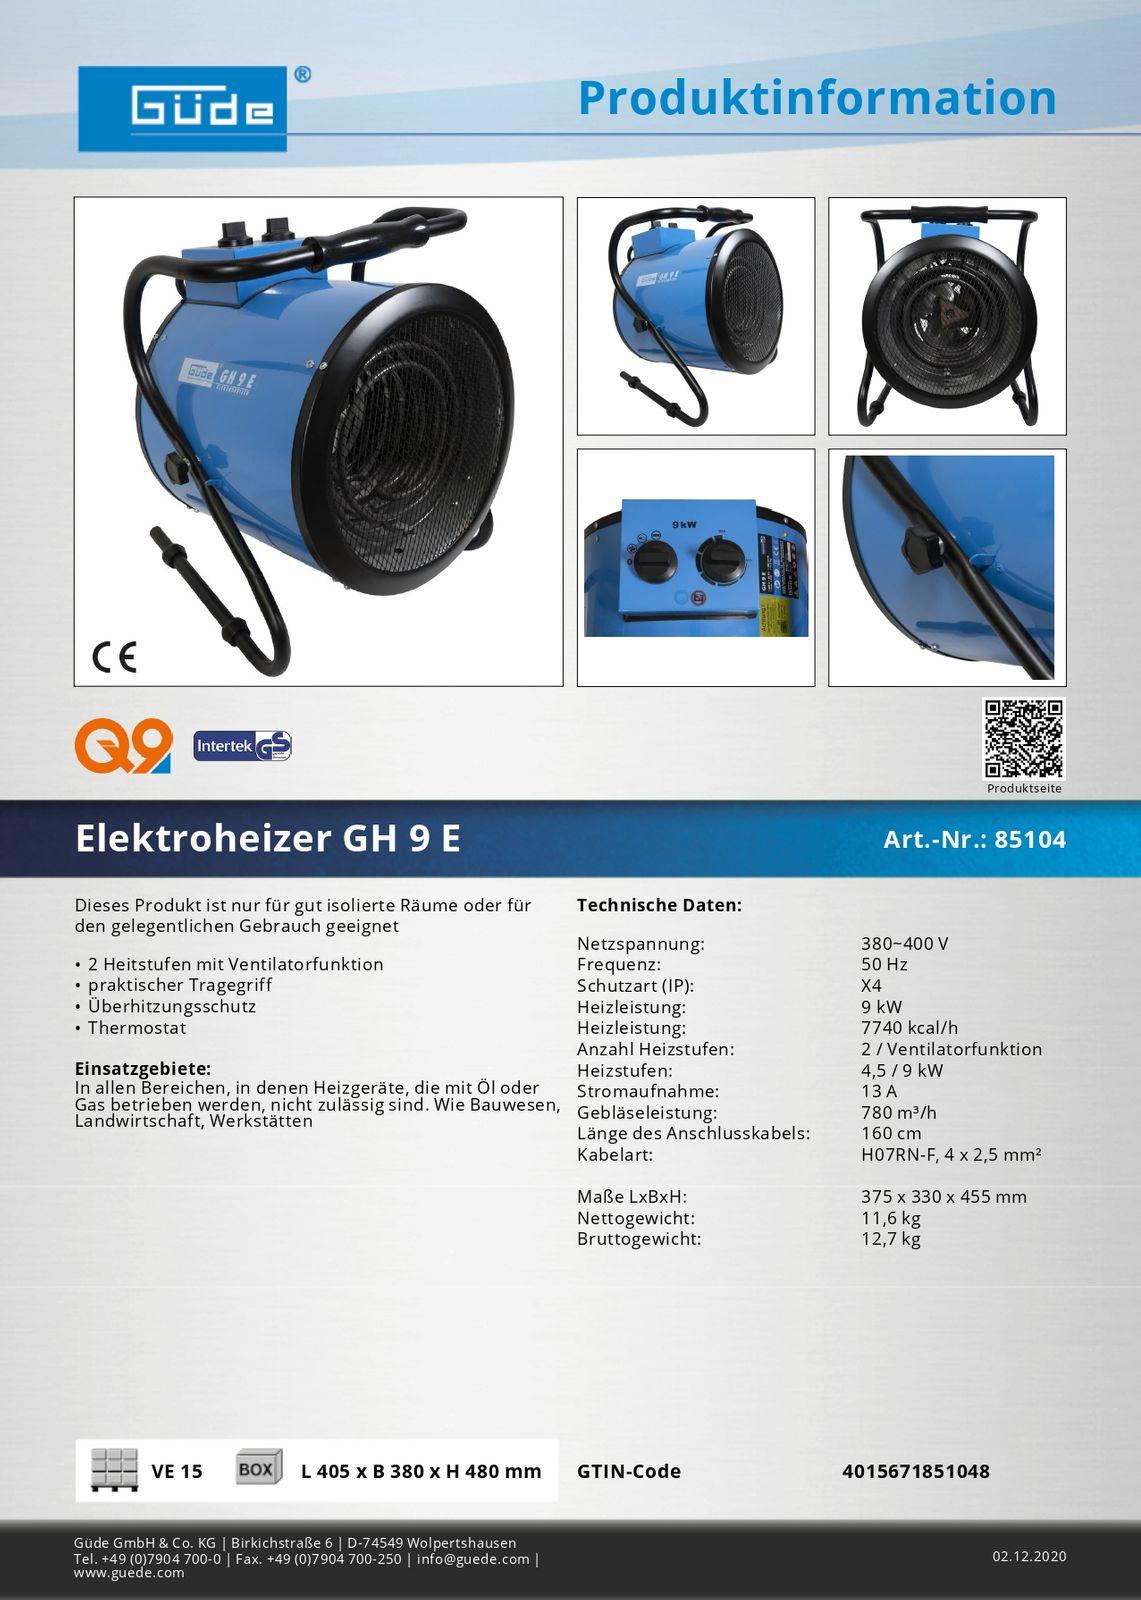 Güde Elektroheizer Heizgebläse Heizlüfter Heizgerät GH 9 E 85104